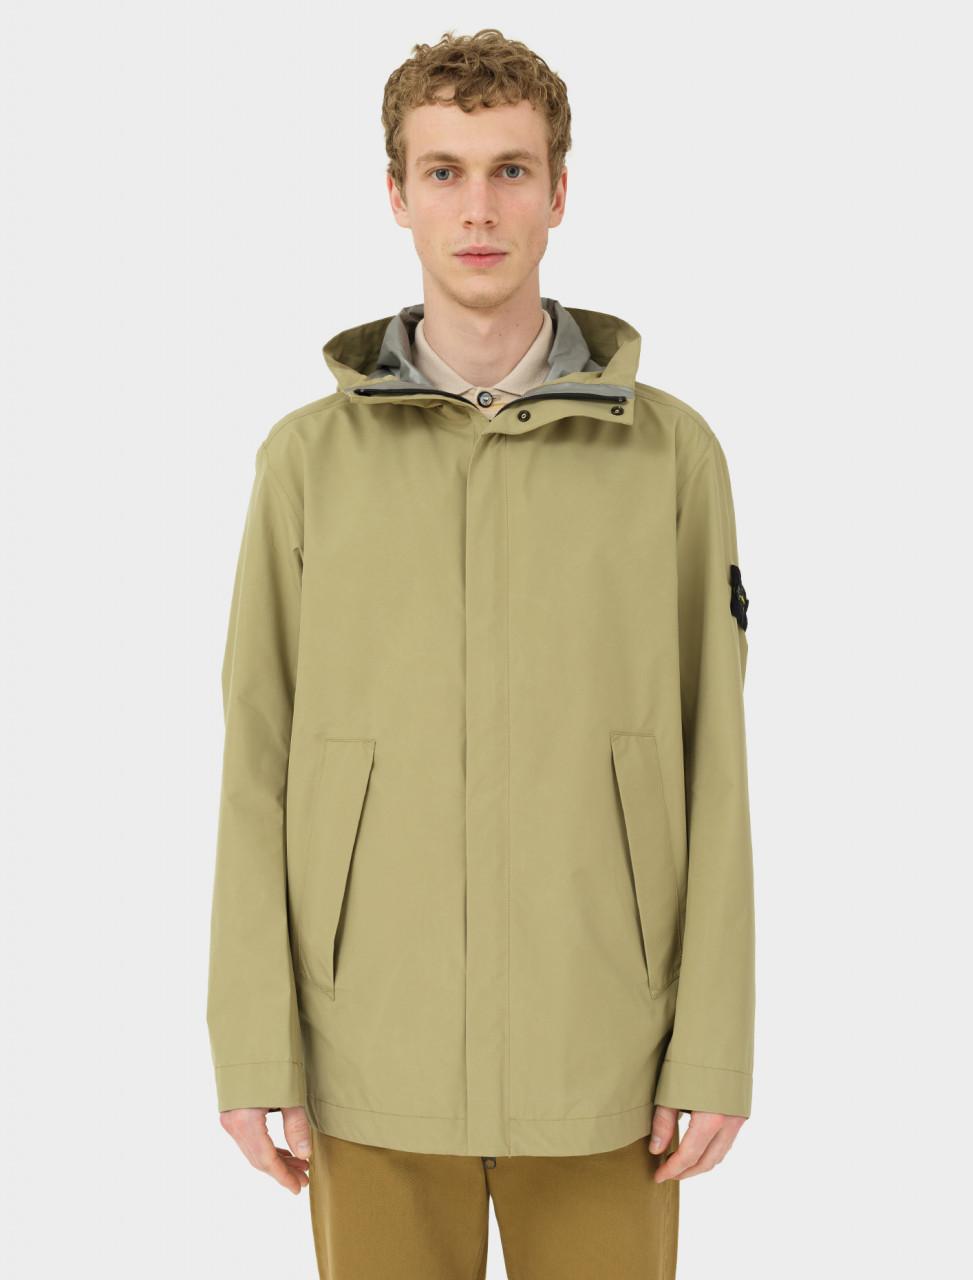 GORE-TEX 'PACLITE' Packable Jacket in Bark